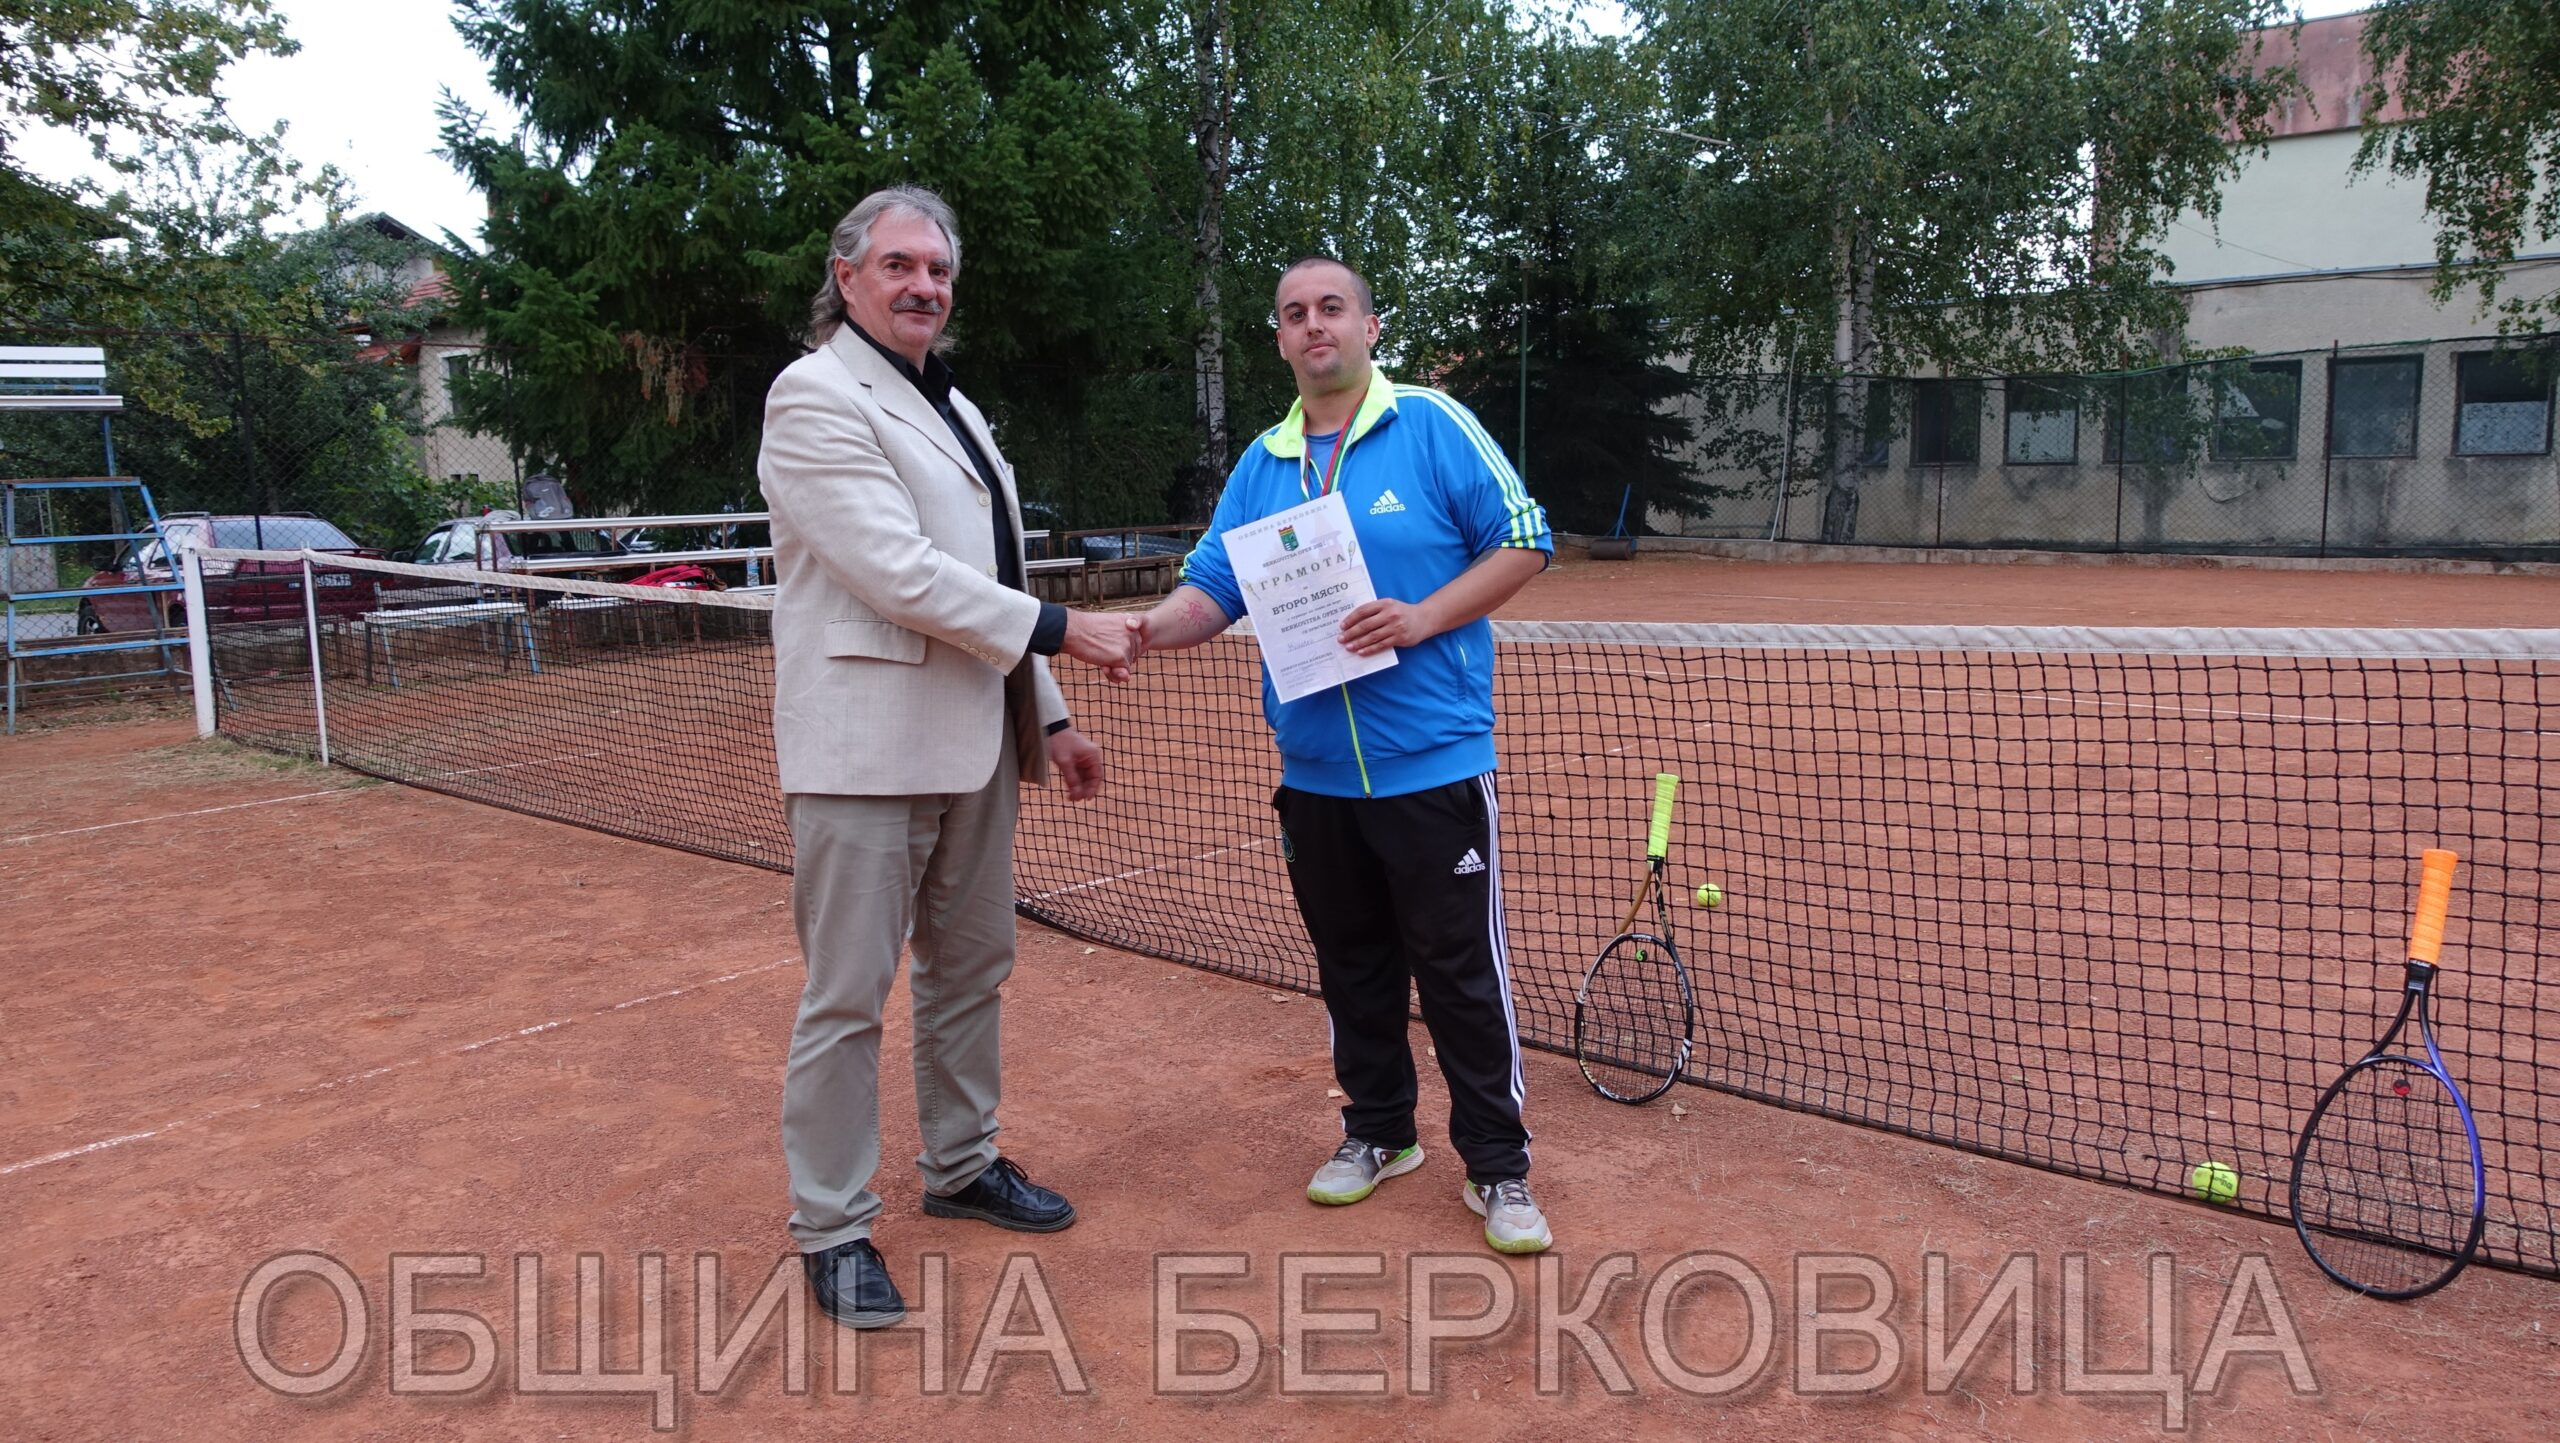 Tенис на корт Berkovitsa open 2021 г.